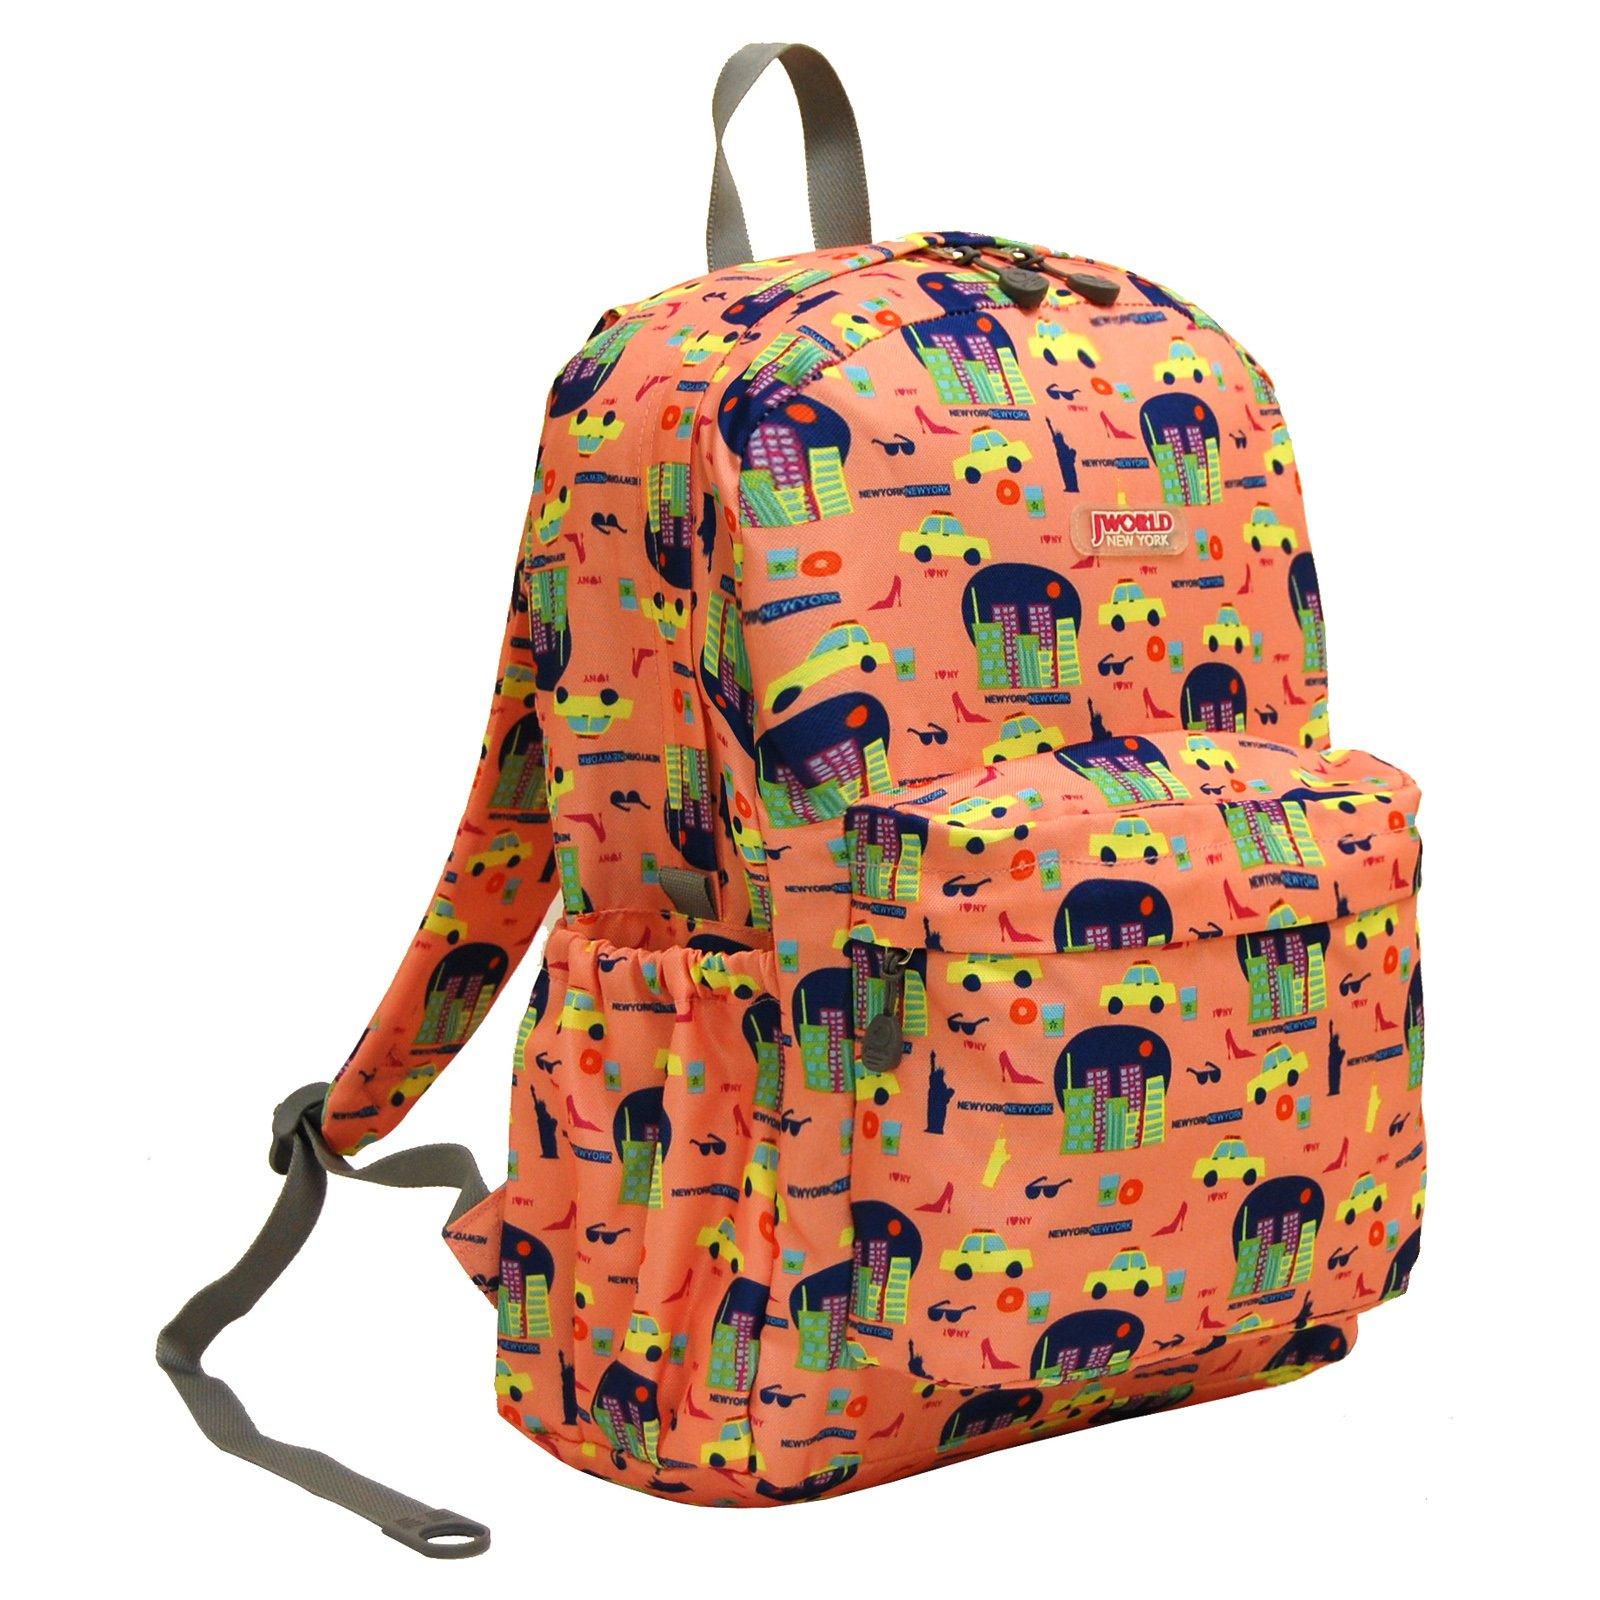 J World New York Oz Backpack, New York, One Size